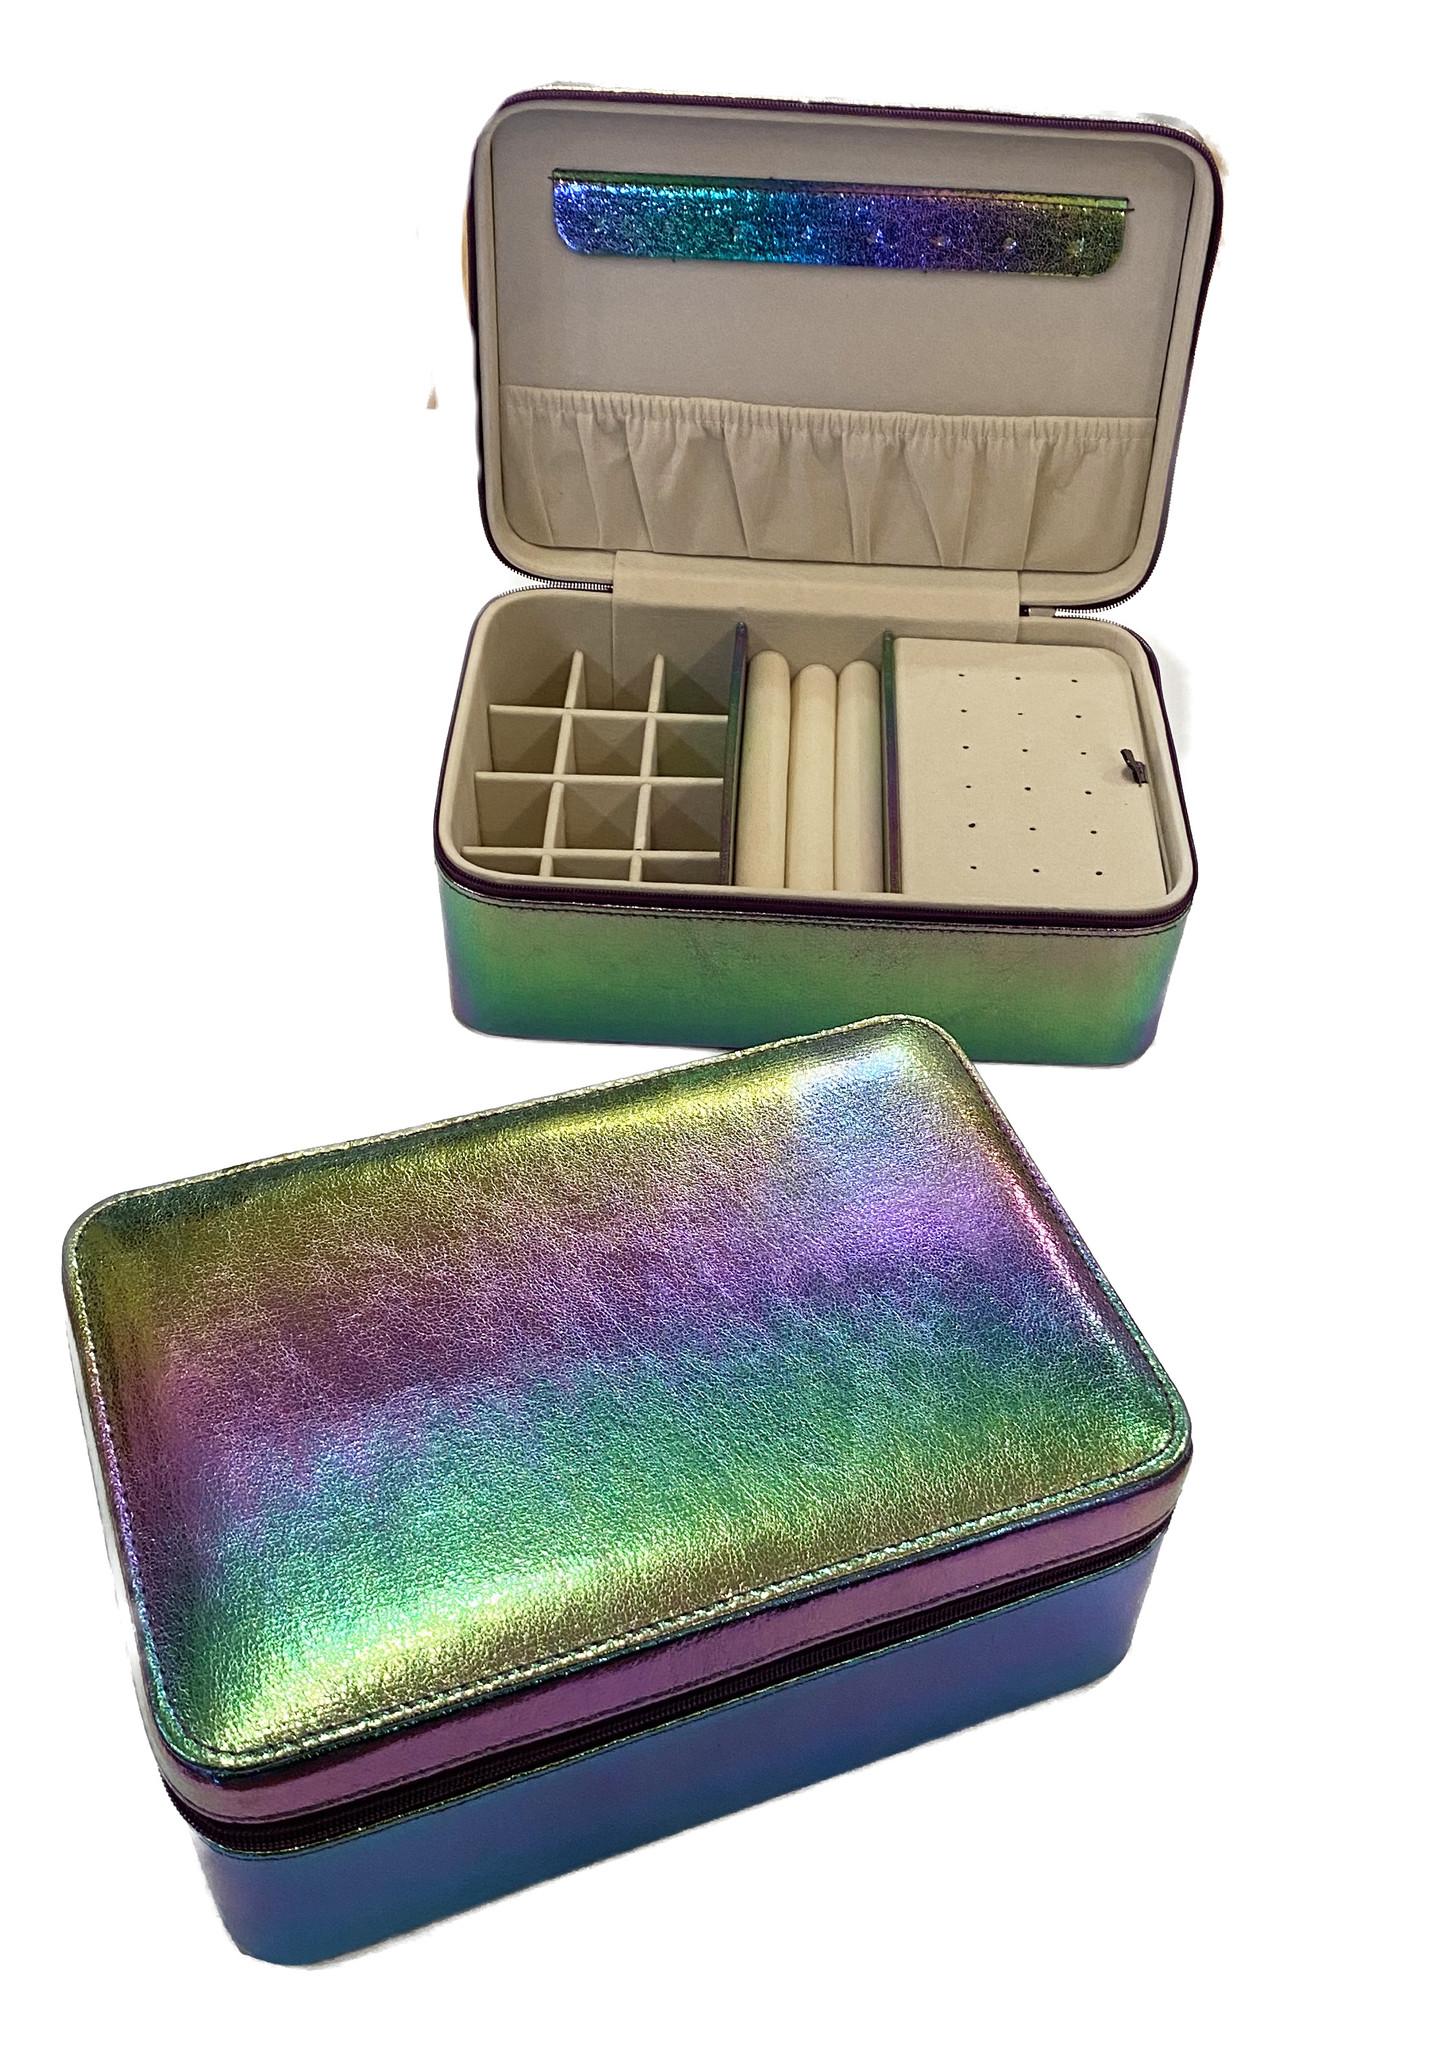 Bari Lynn Jewelry Box - Metallic Ombre Rainbow